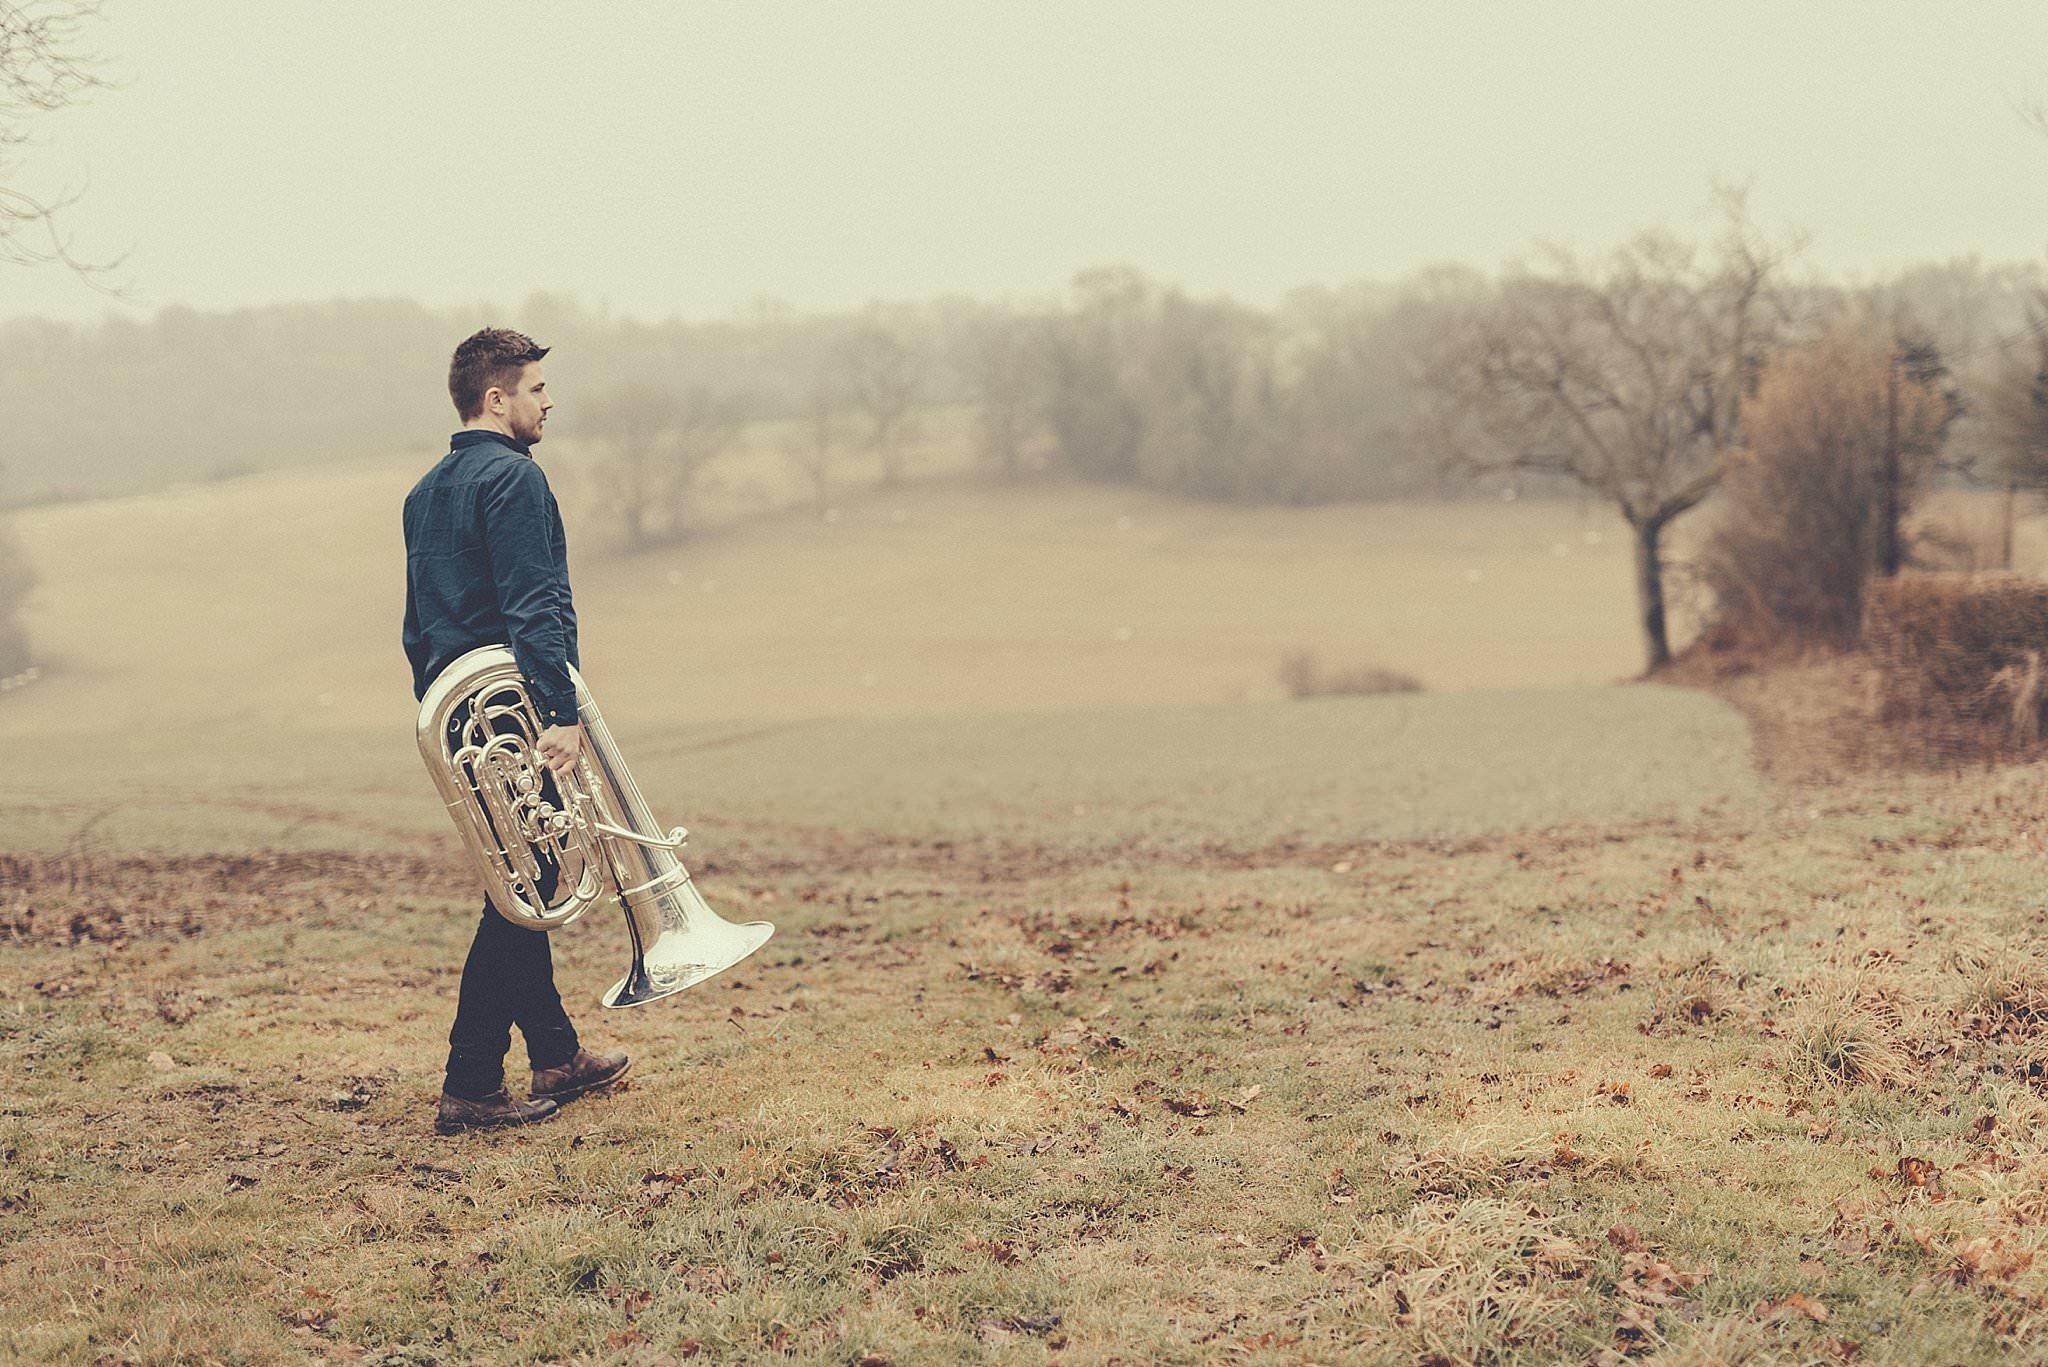 aga-tomaszek-music-photographer-cardiff_1325